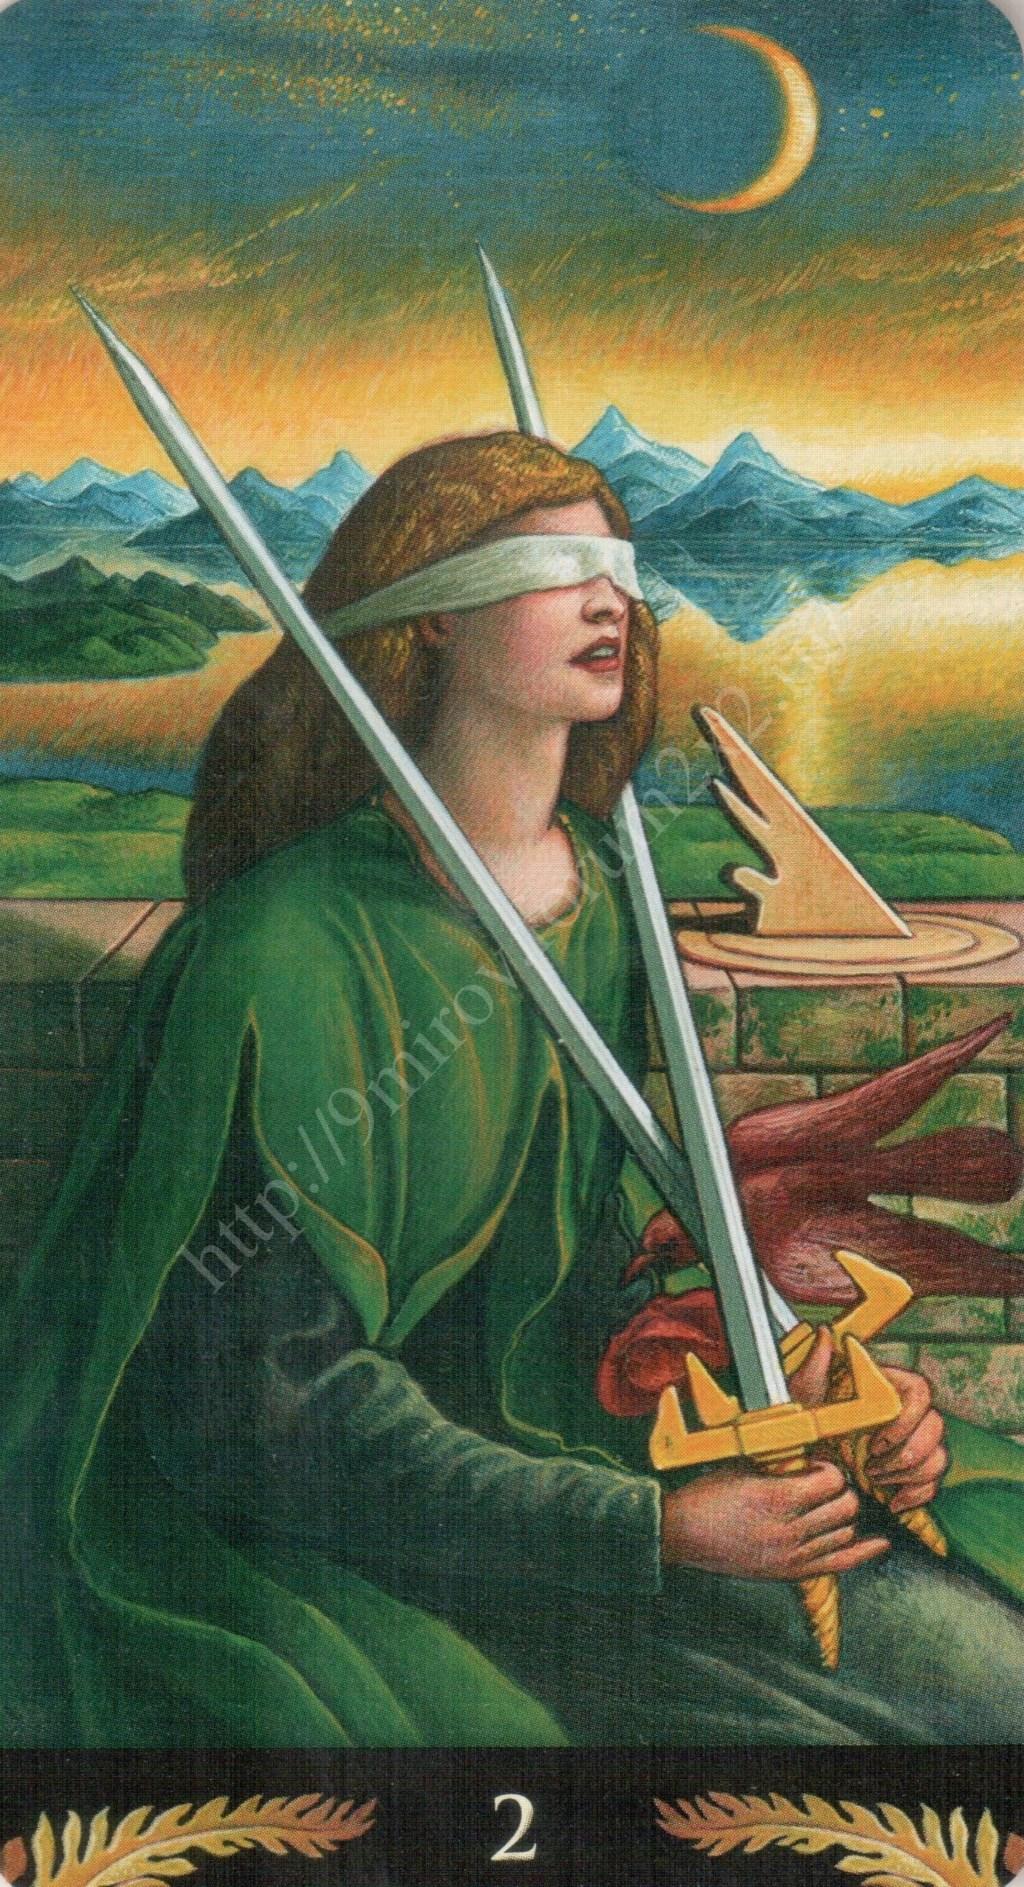 Таро Прерафаэлитов (Pre-Raphaelite Tarot) Галерея Water415